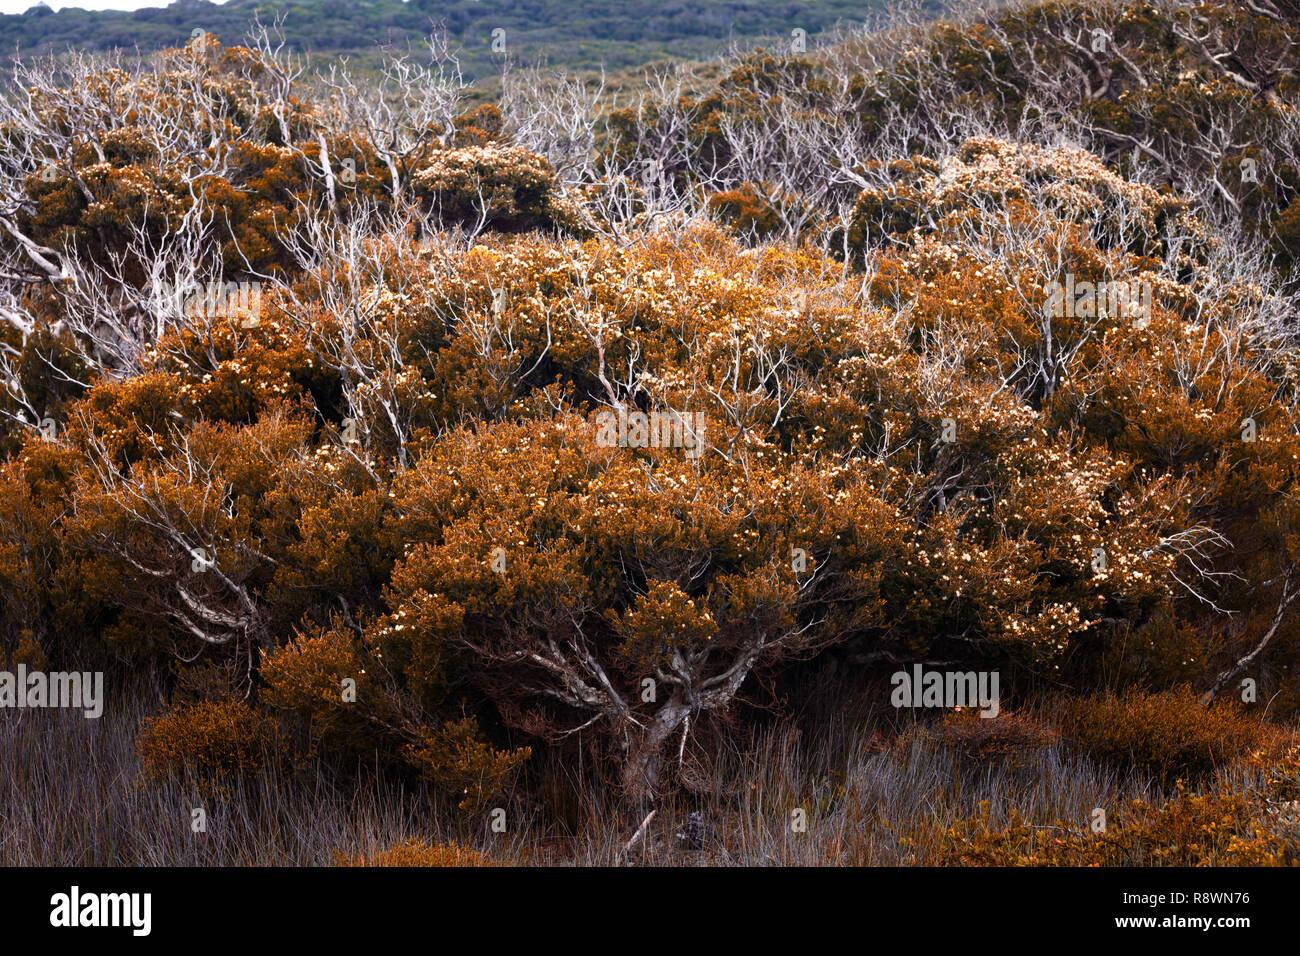 tree foliage - Stock Image